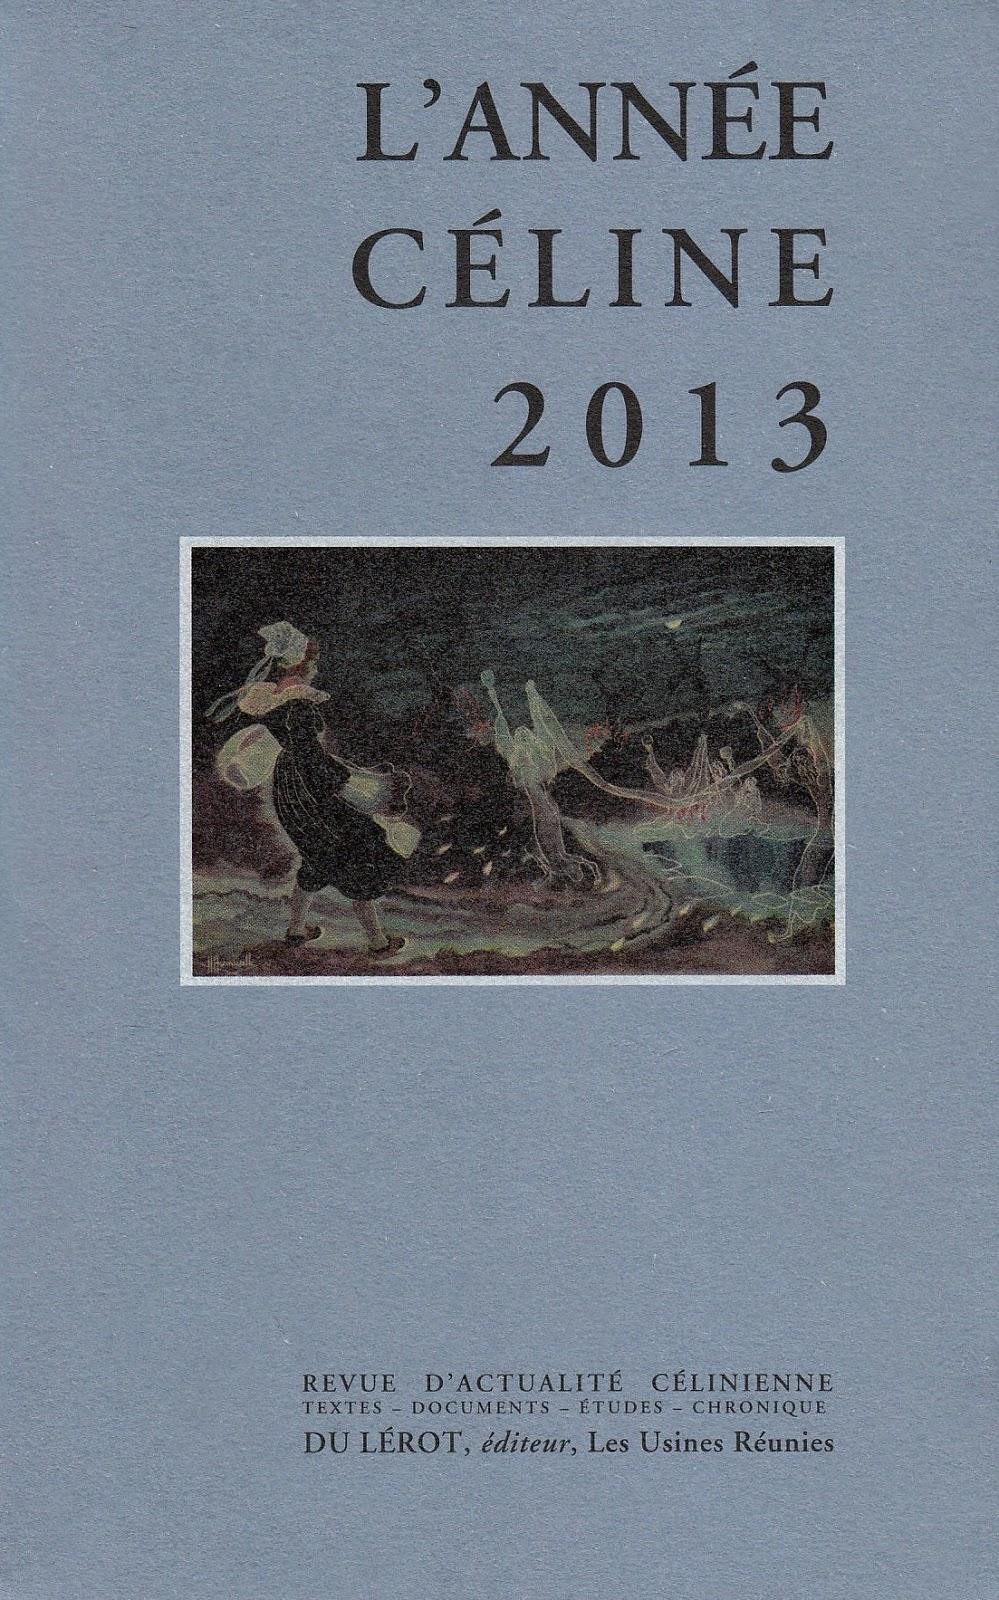 lannee-celine-2013